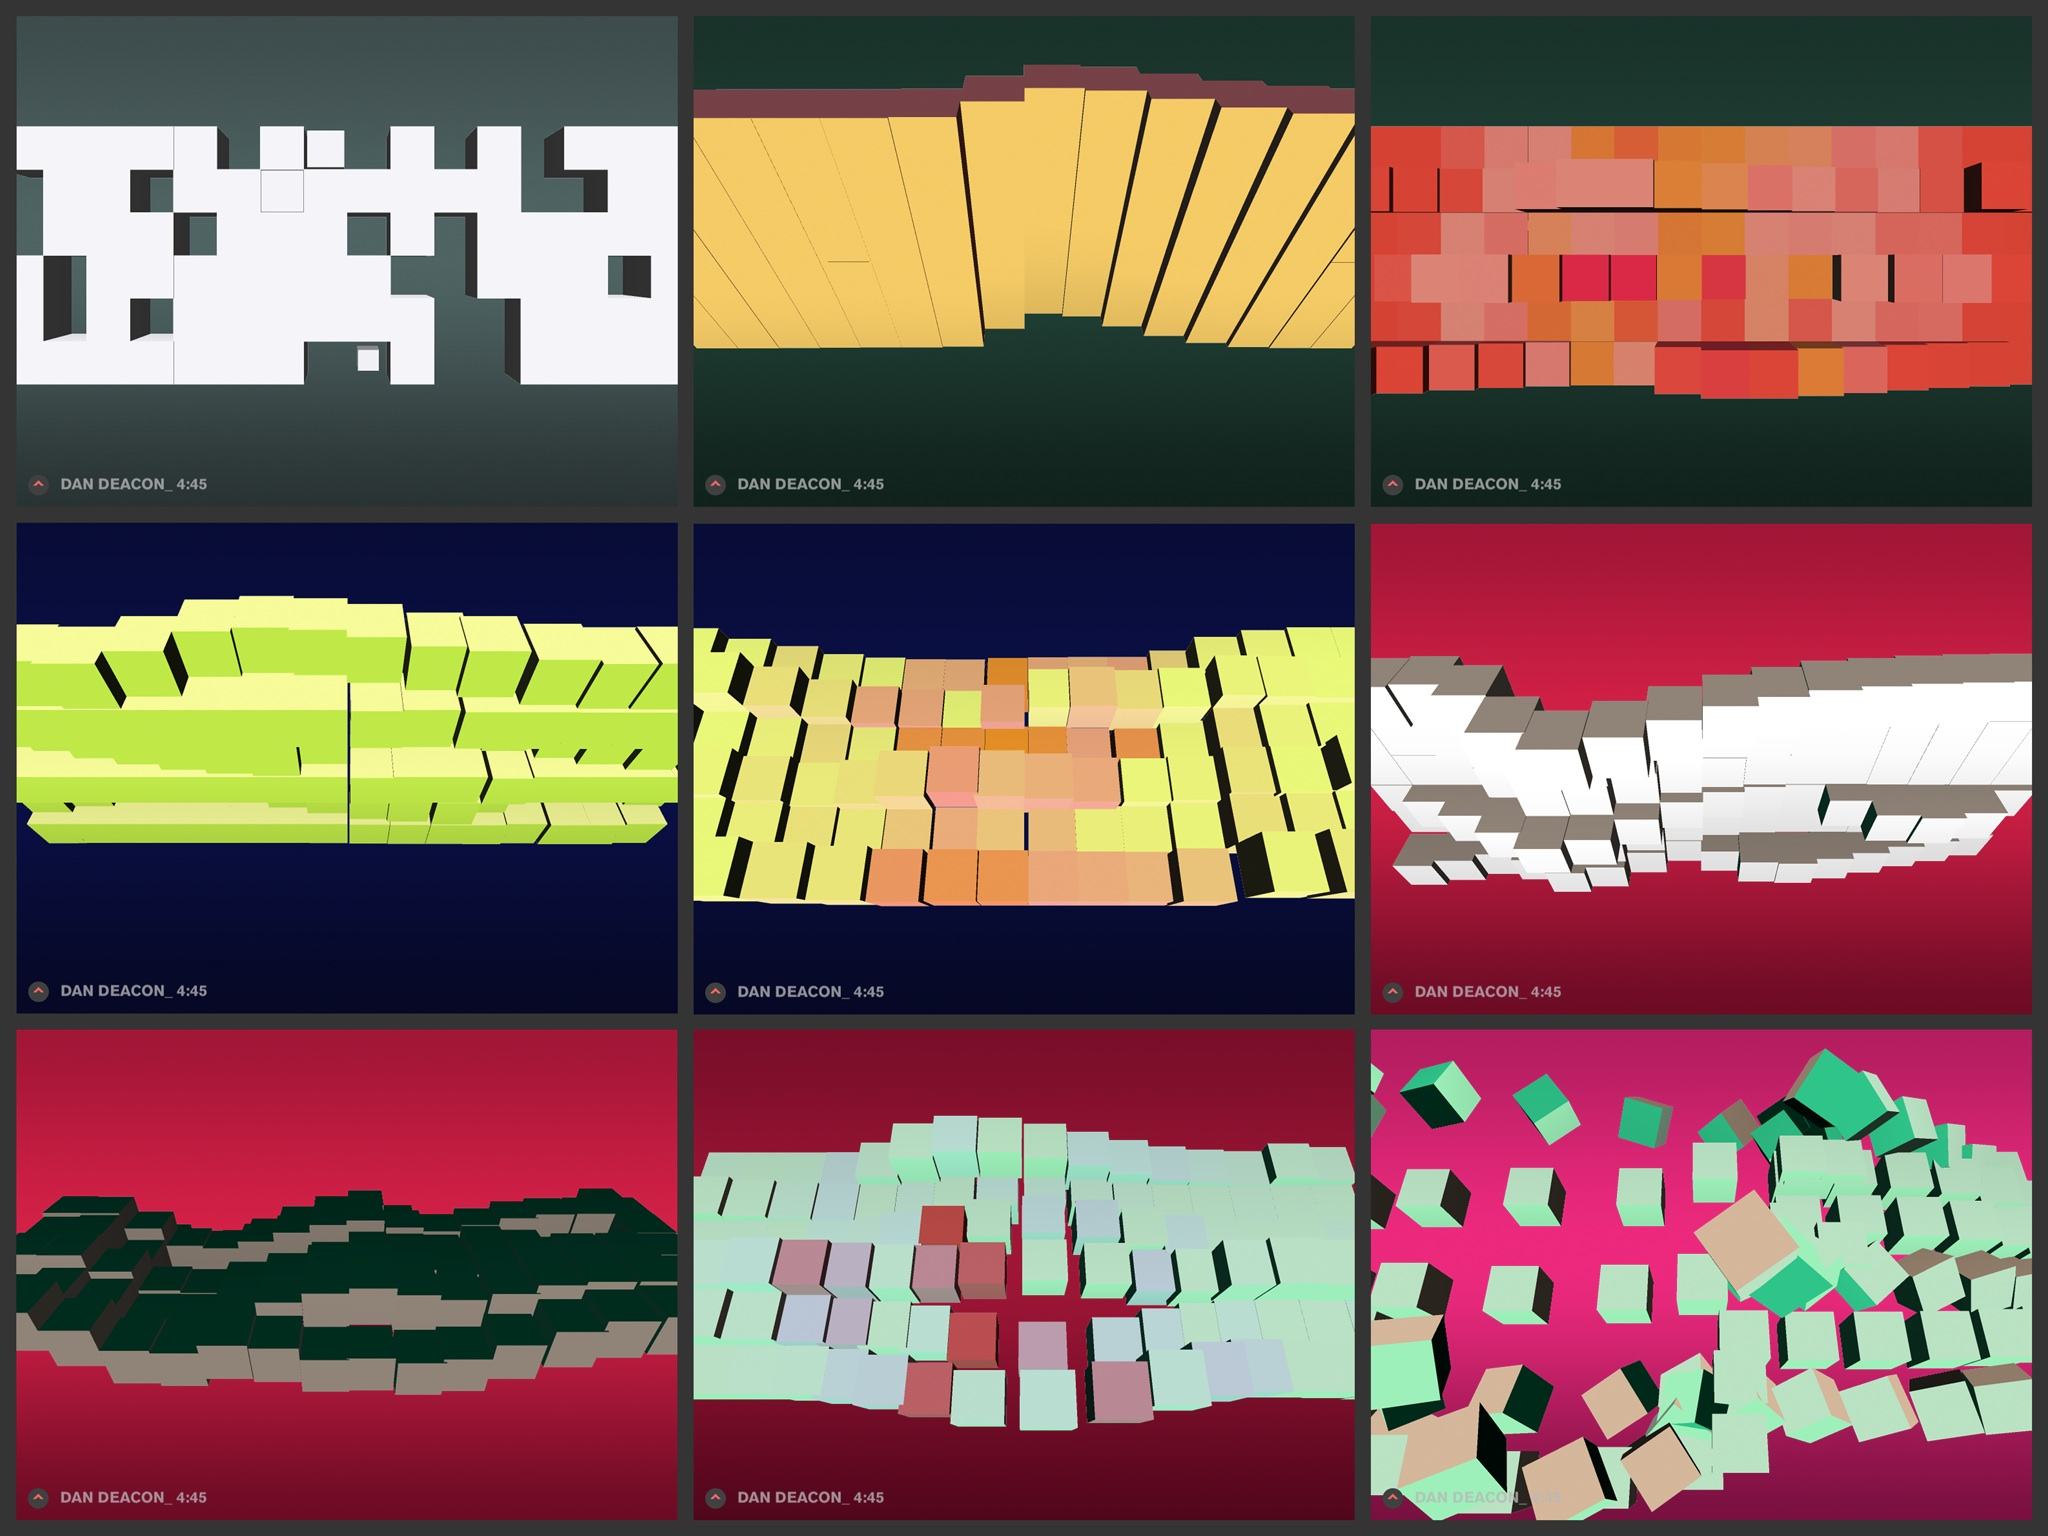 glass-iPad-DanDeacon-comp-2048x1536.jpg